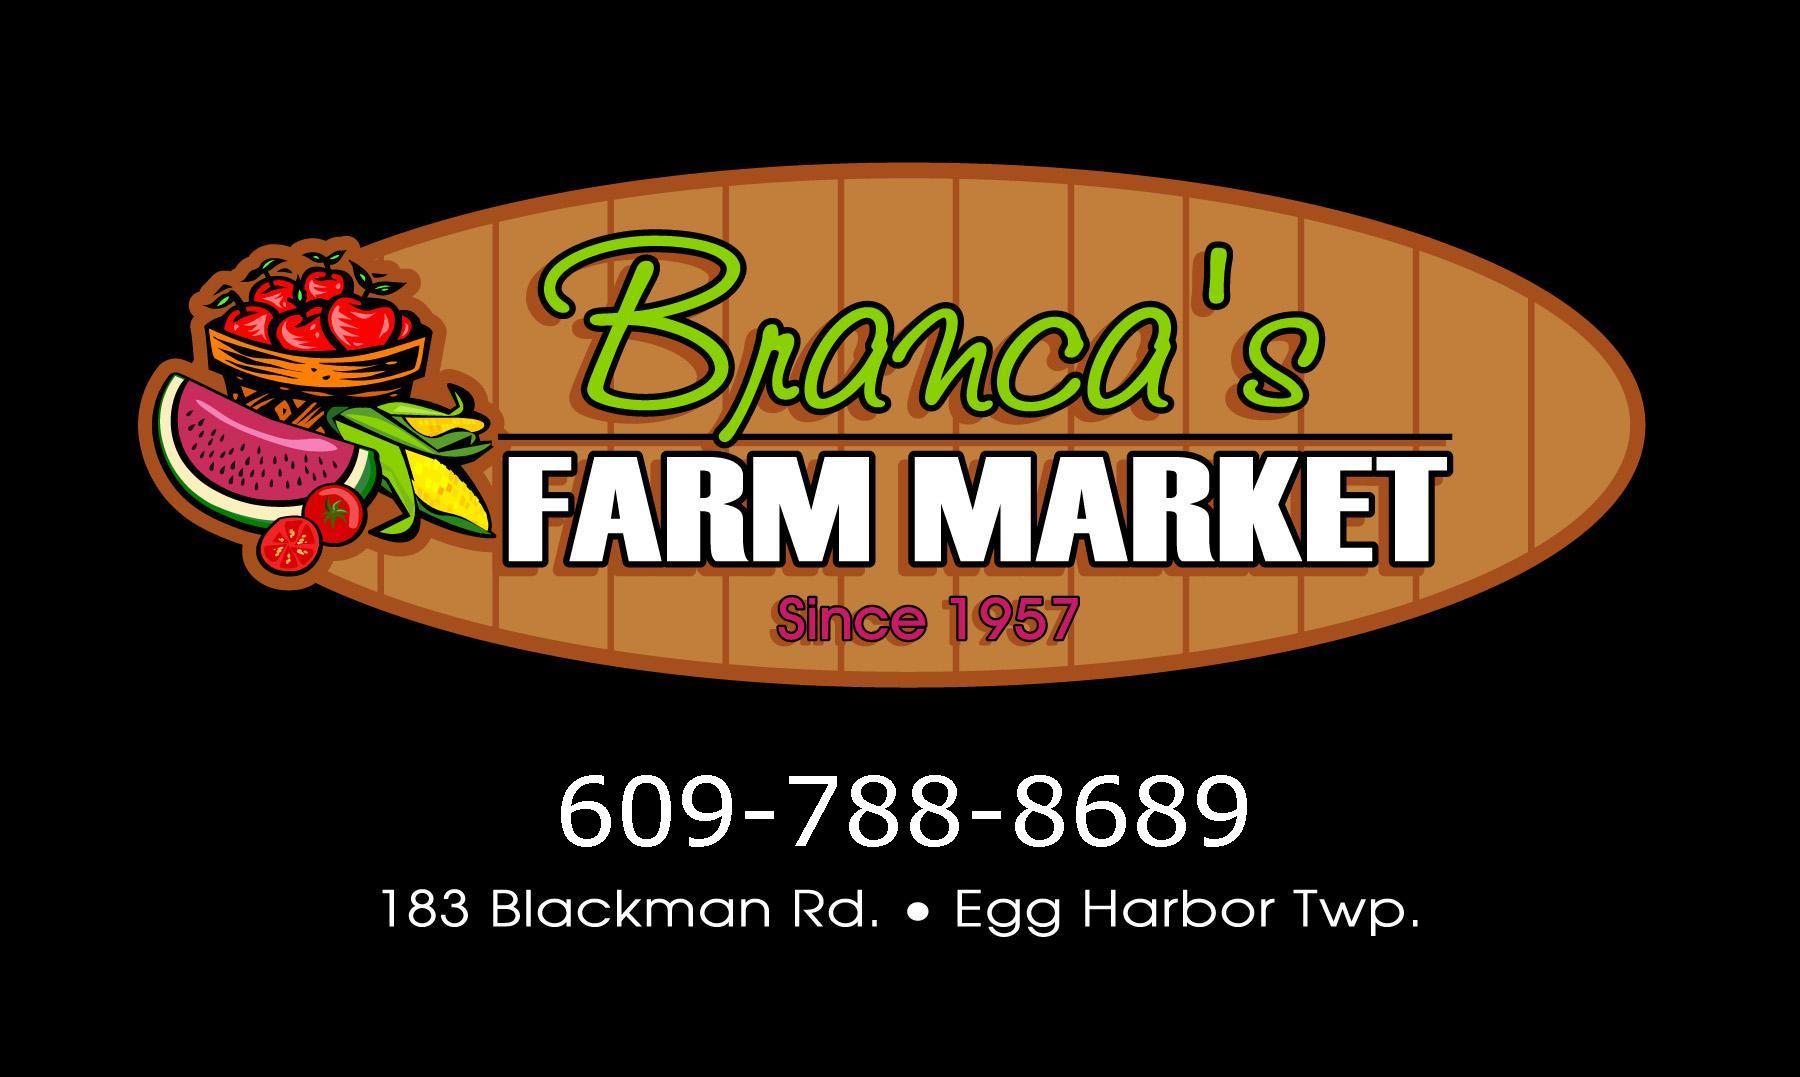 Branca's FM